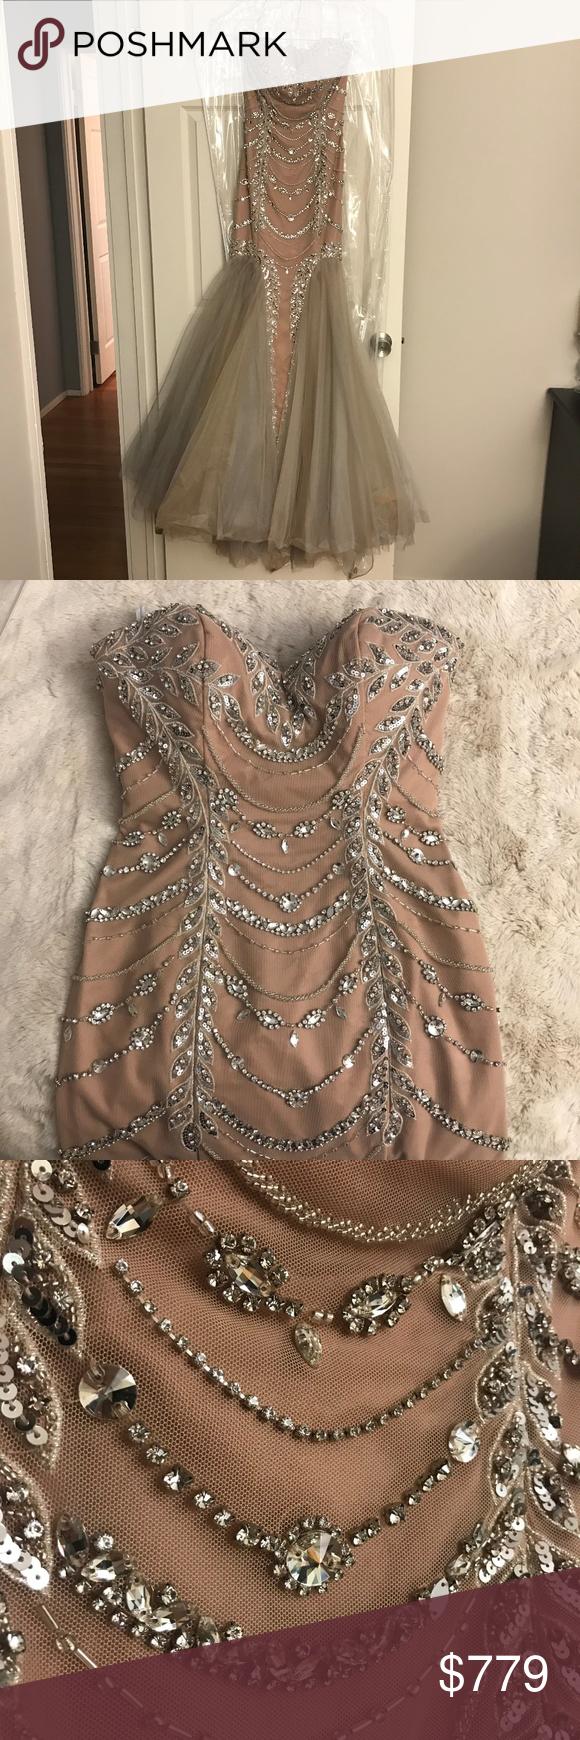 Sherri Hill Embellished Mermaid Dress Sherri Hill Embellished Mermaid Dress Blush Tan Color Bodice With Taupe And M Dresses Mermaid Prom Dresses Mermaid Dress [ 1740 x 580 Pixel ]